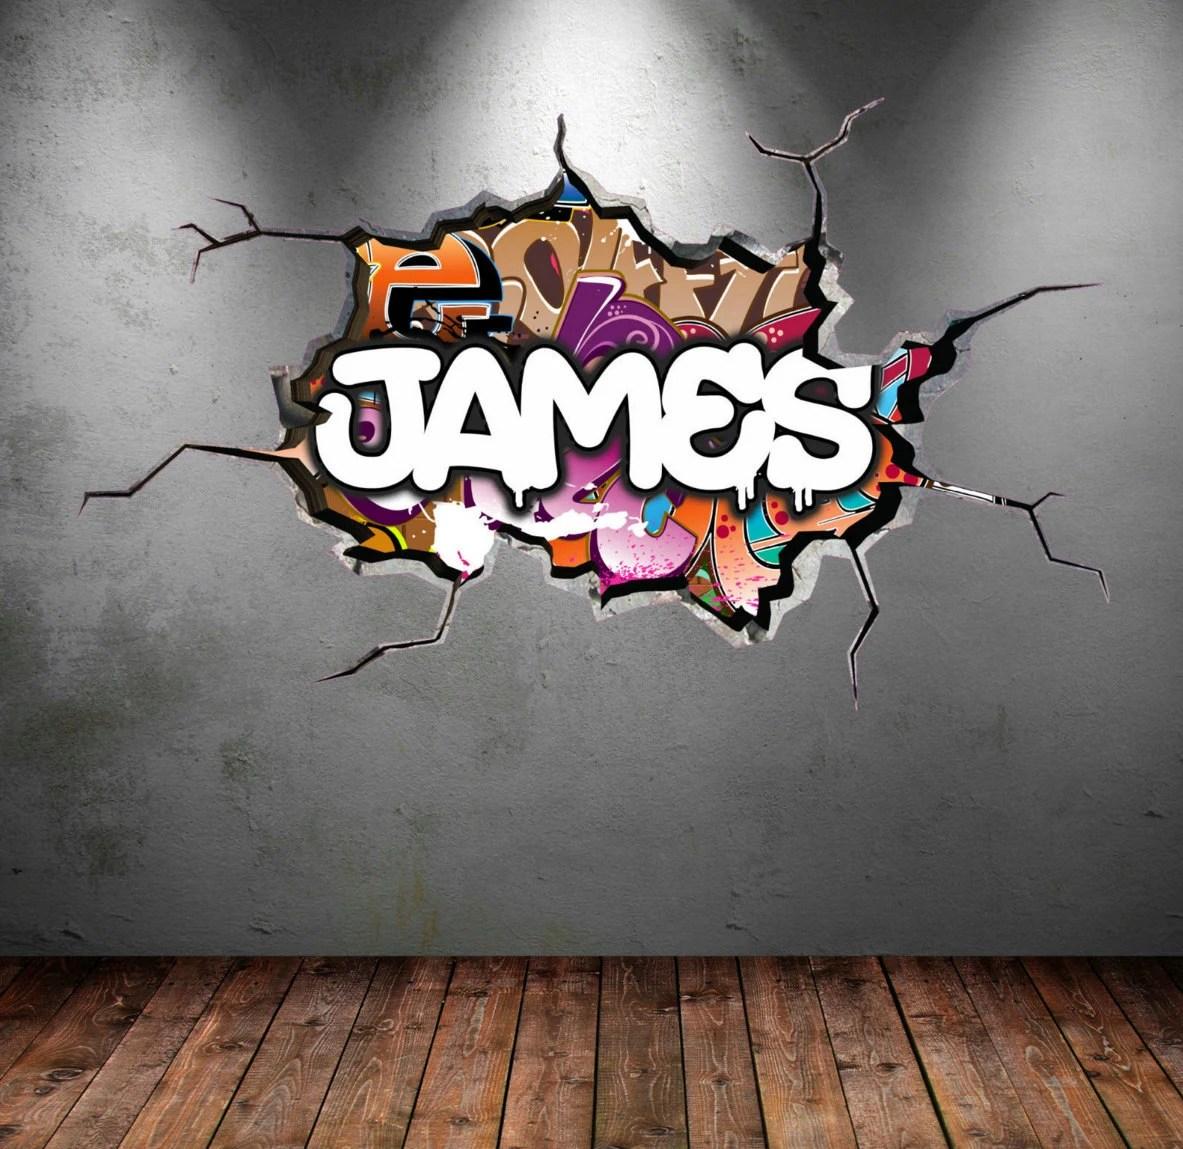 Personnalis Graffiti prnom sticker fissur mur 3D vinyle mur